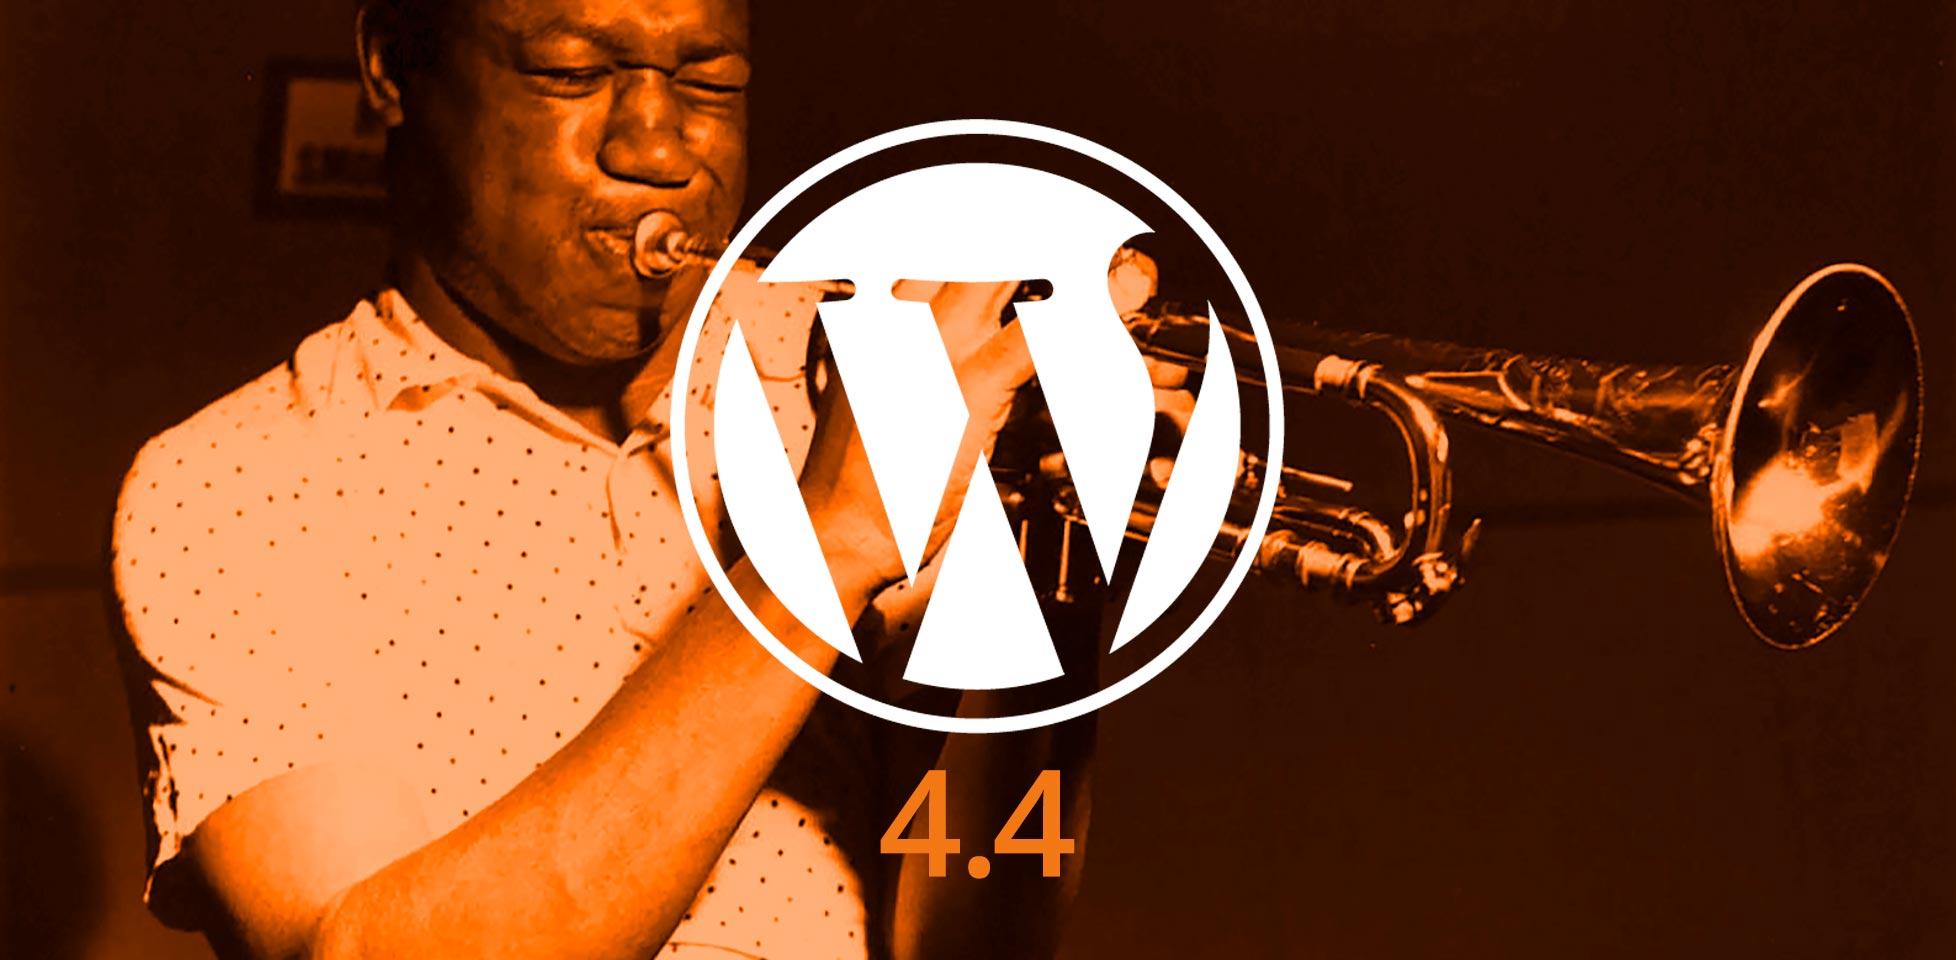 WordPress 4.4 will revolutionize how we publish